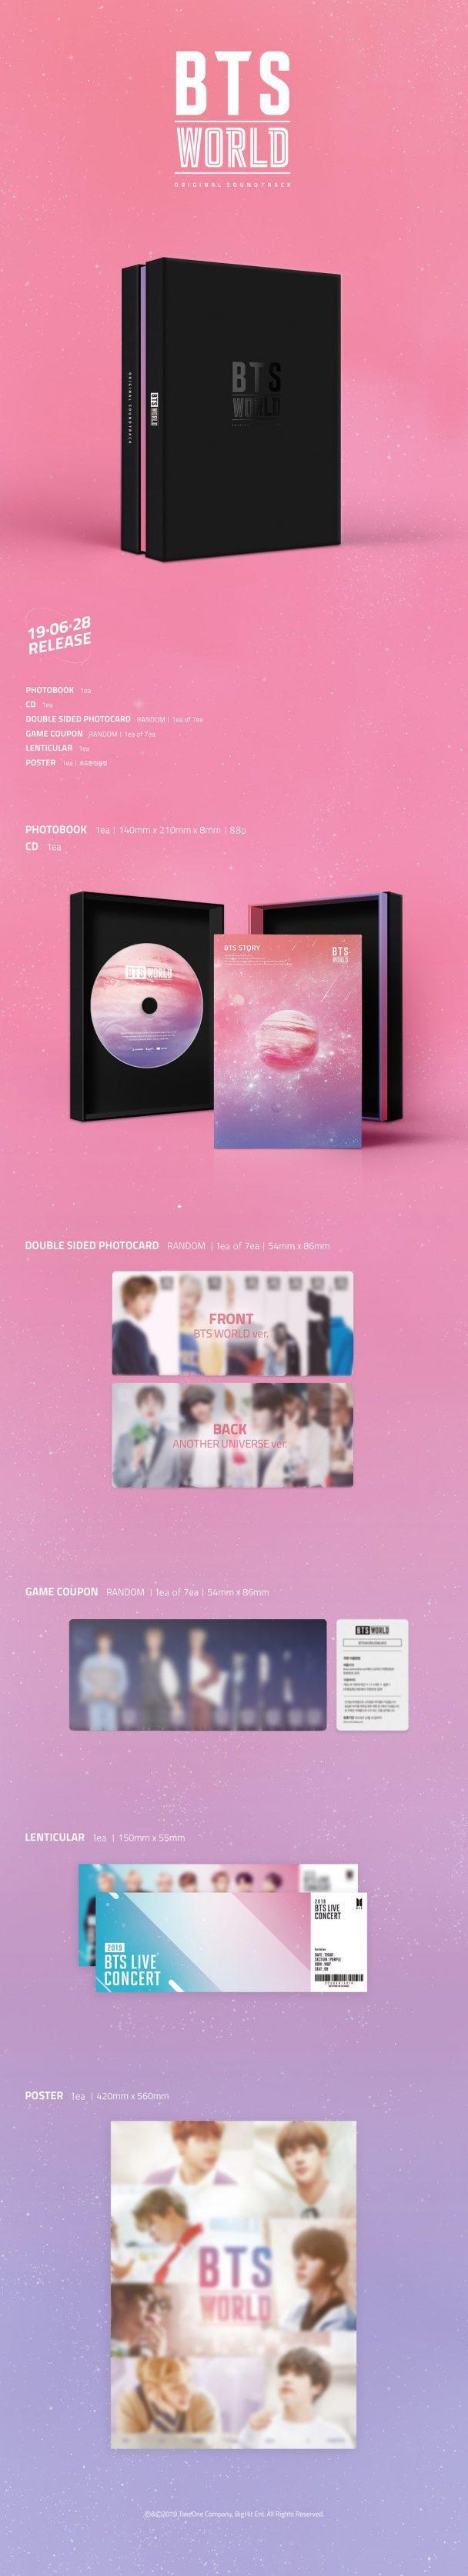 BTS-WORLD-OST